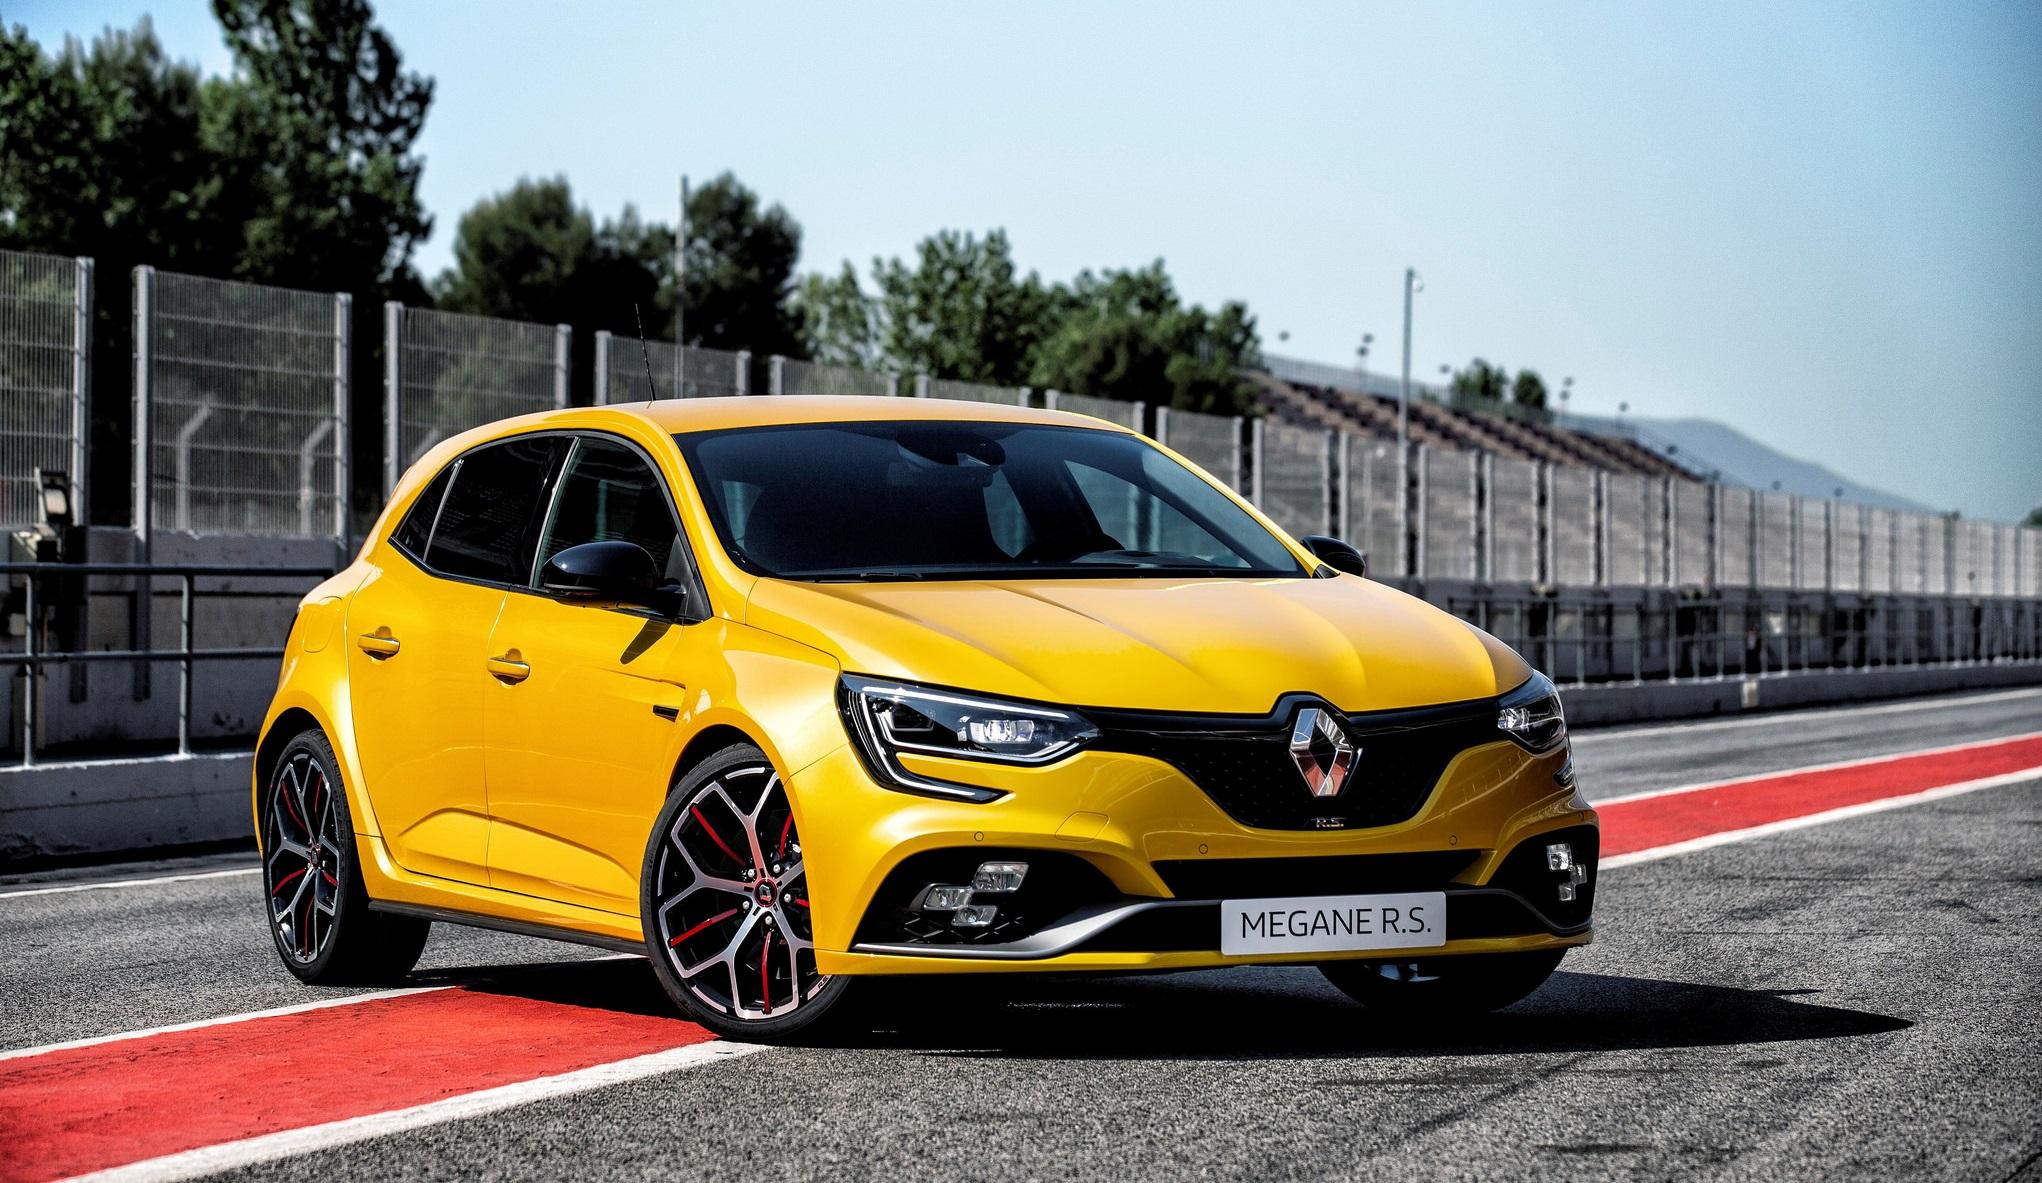 Tudo o que se sabe sobre o novo Renault Mégane R.S. Trophy